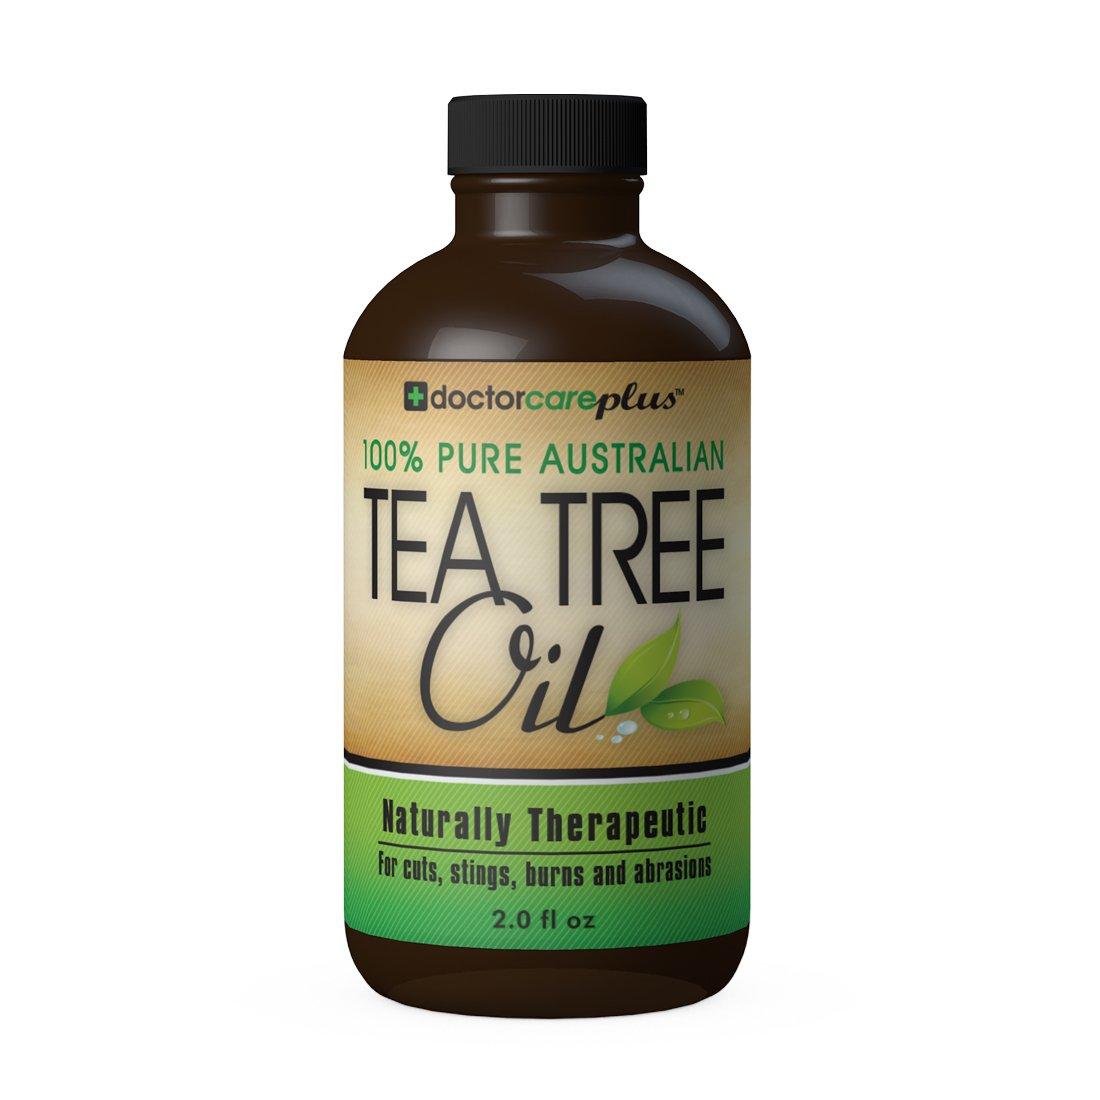 Tea Tree Oil - 100% Pure ATTIA Certified, Essential Oil from Australia (2 oz) - Superior Grade Especially For: Skin Tags, Acne, Fungus, Odor, Lice, Shampoo, Antiseptic, Eczema, Cuts, Burns and